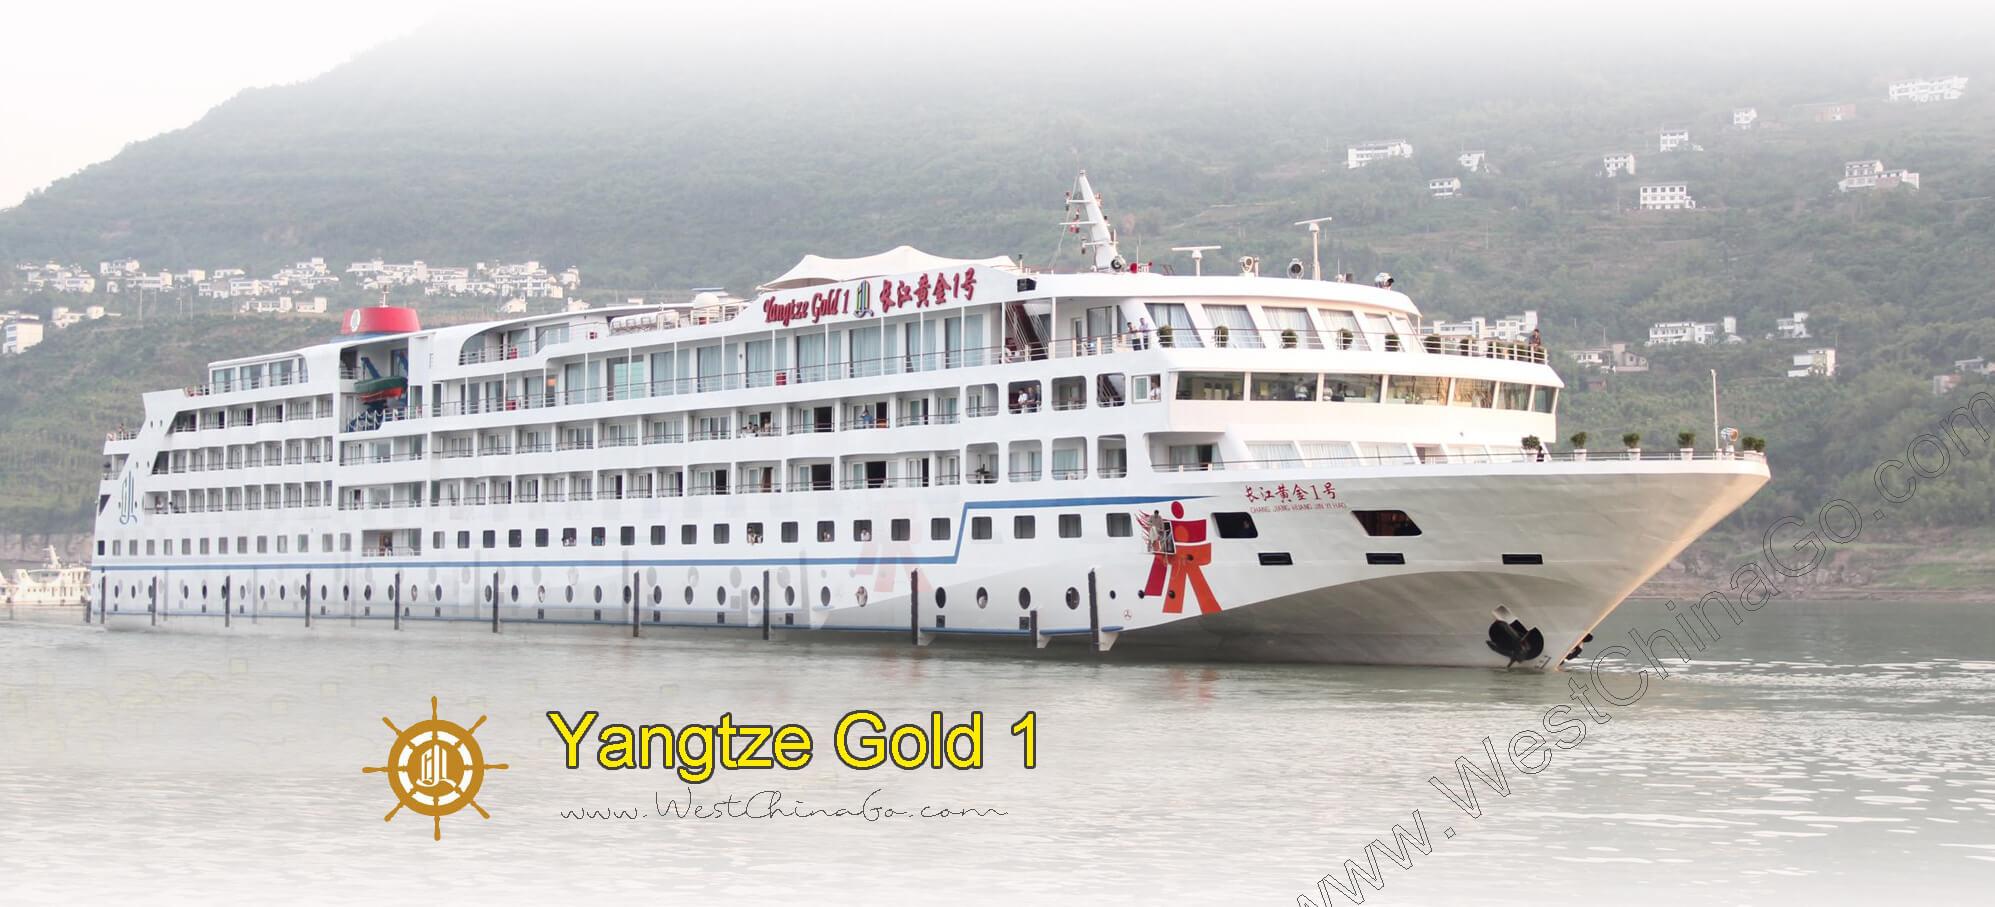 YANGTZE RIVER-Gold 1 Ship Fleet